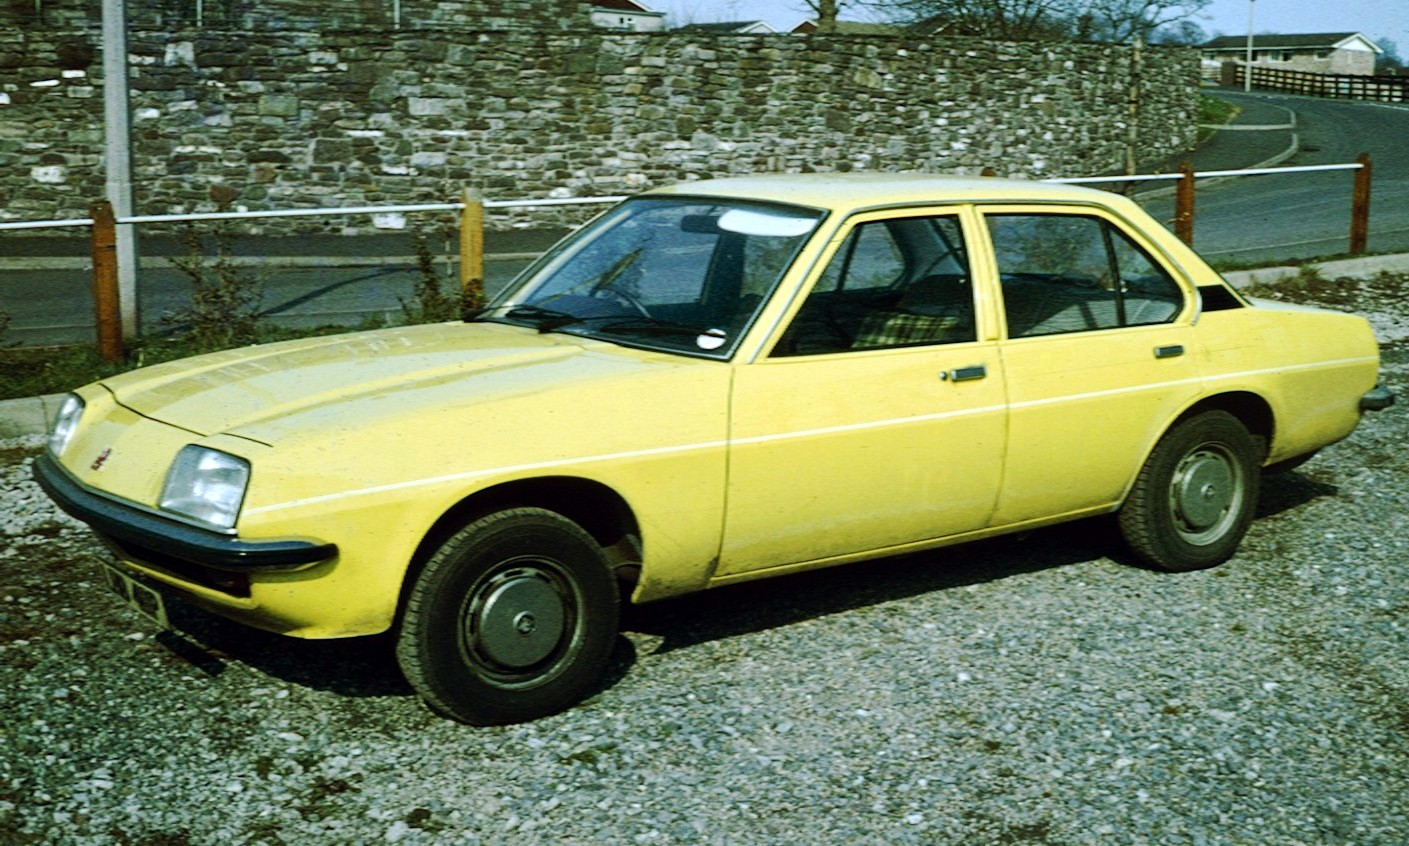 Vauxhall Cavalier (1976)